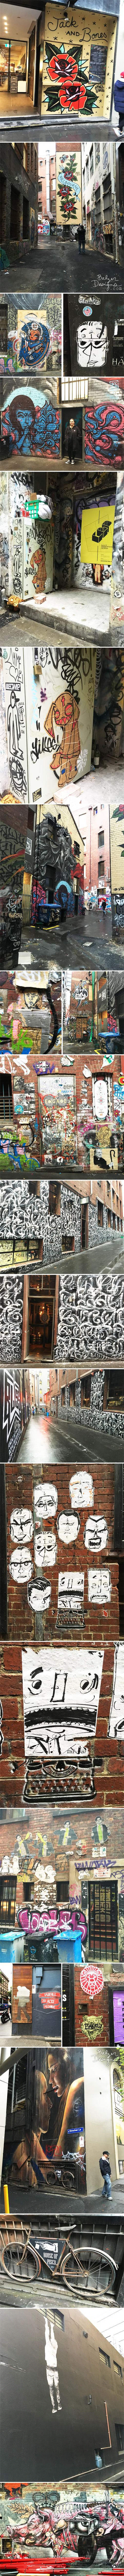 From the Balzer Designs Blog: Melbourne Street Art